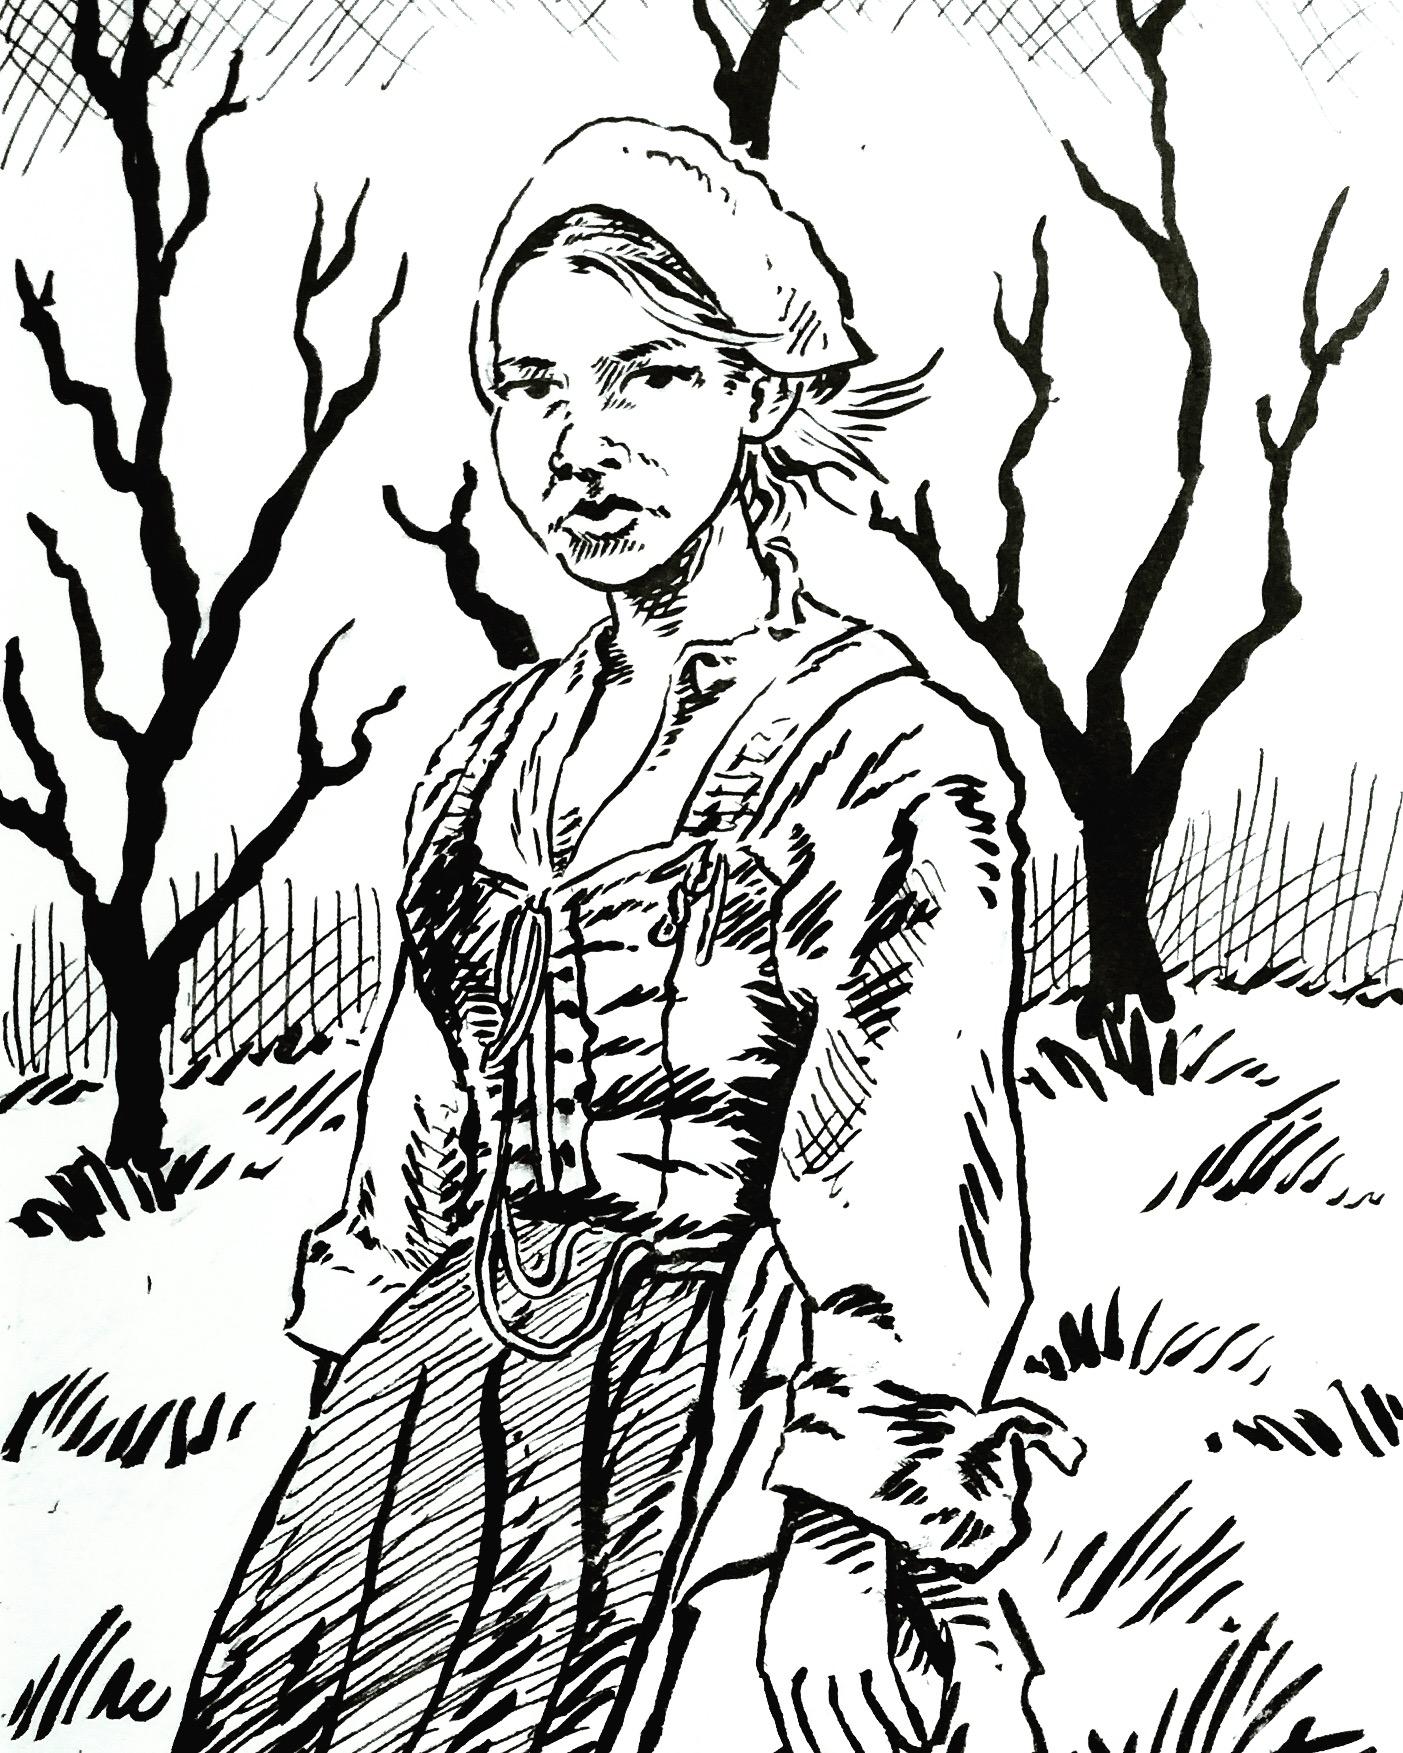 comic-2016-10-11-Inktober.jpg